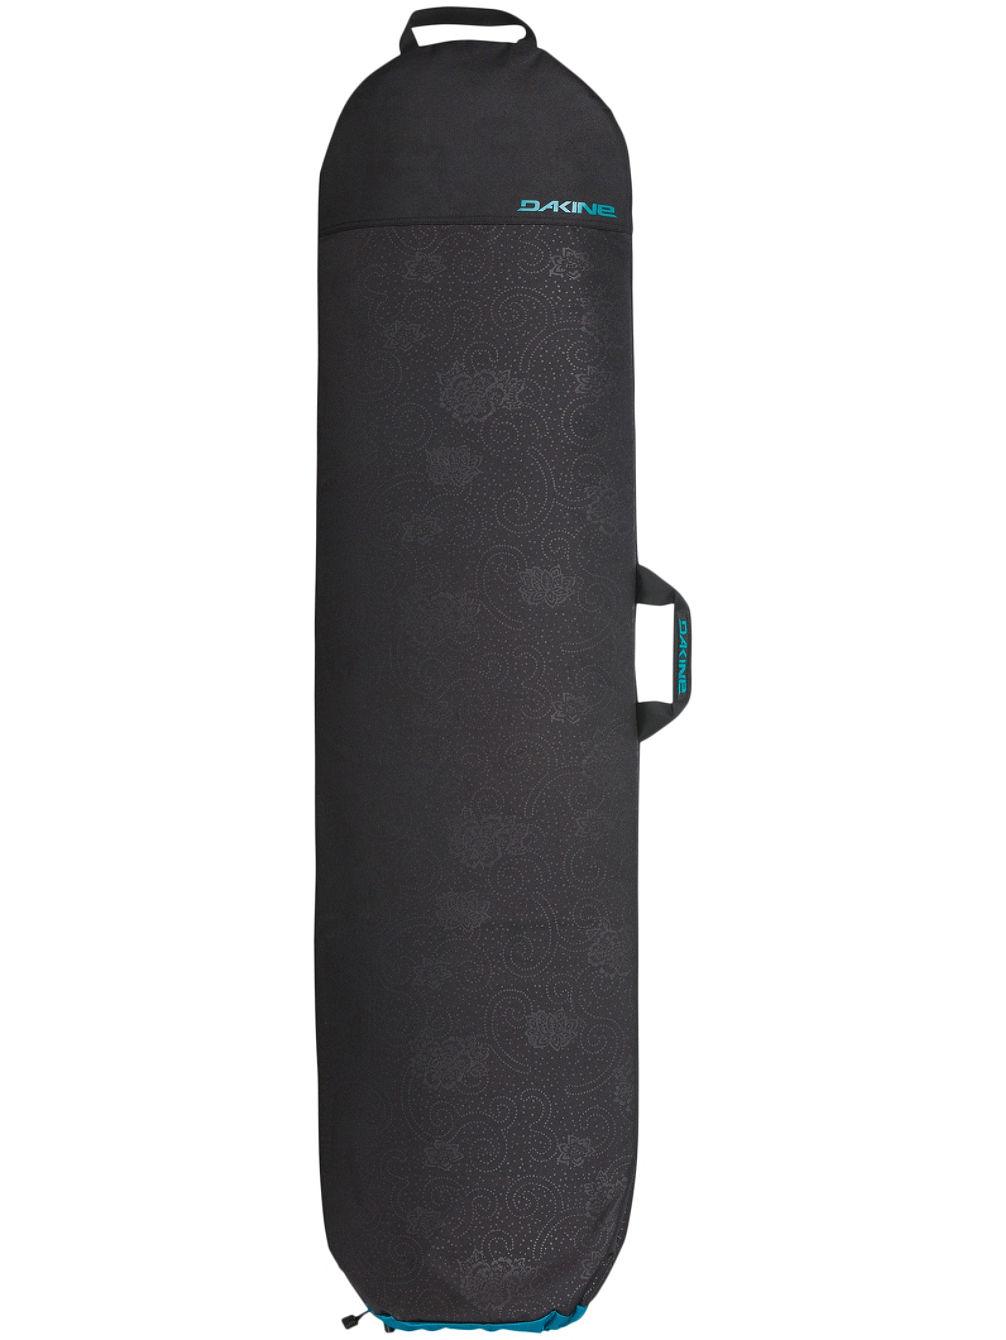 Dakine snowboard bag bing images for Housse burton snowboard